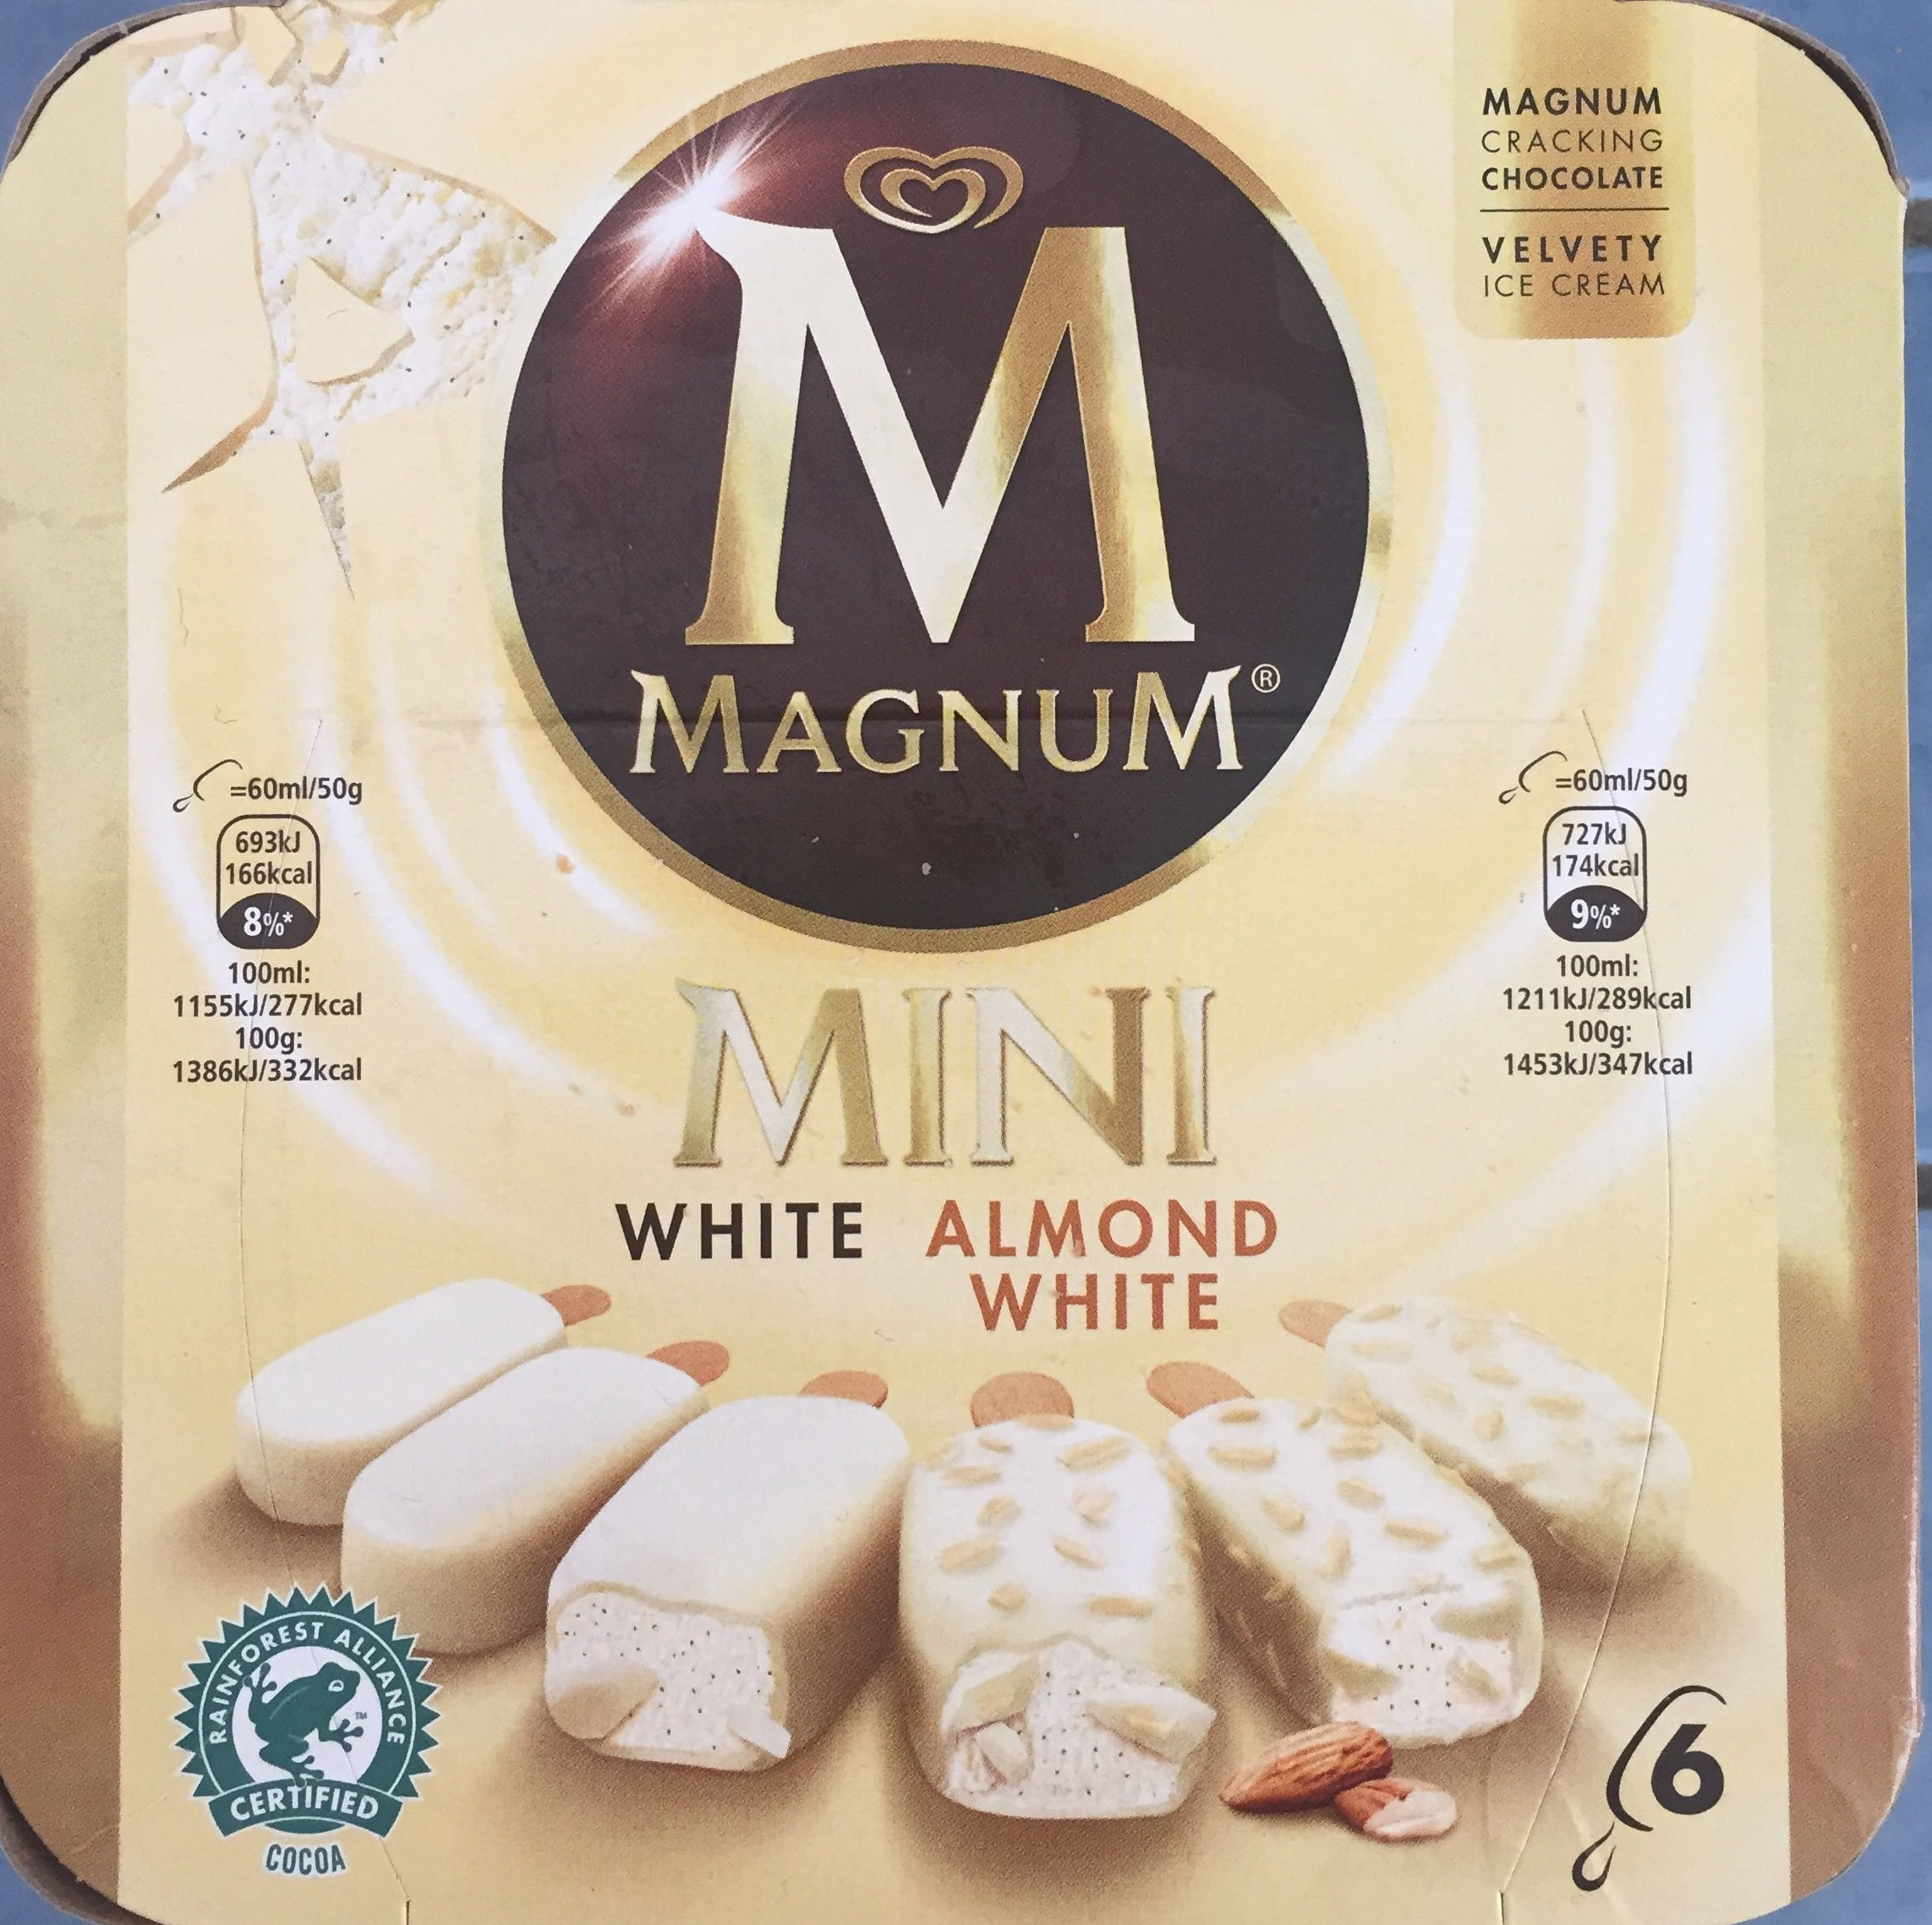 Magnum Mini Batonnet Glace Chocolat Blanc Amande x6 - Produit - fr